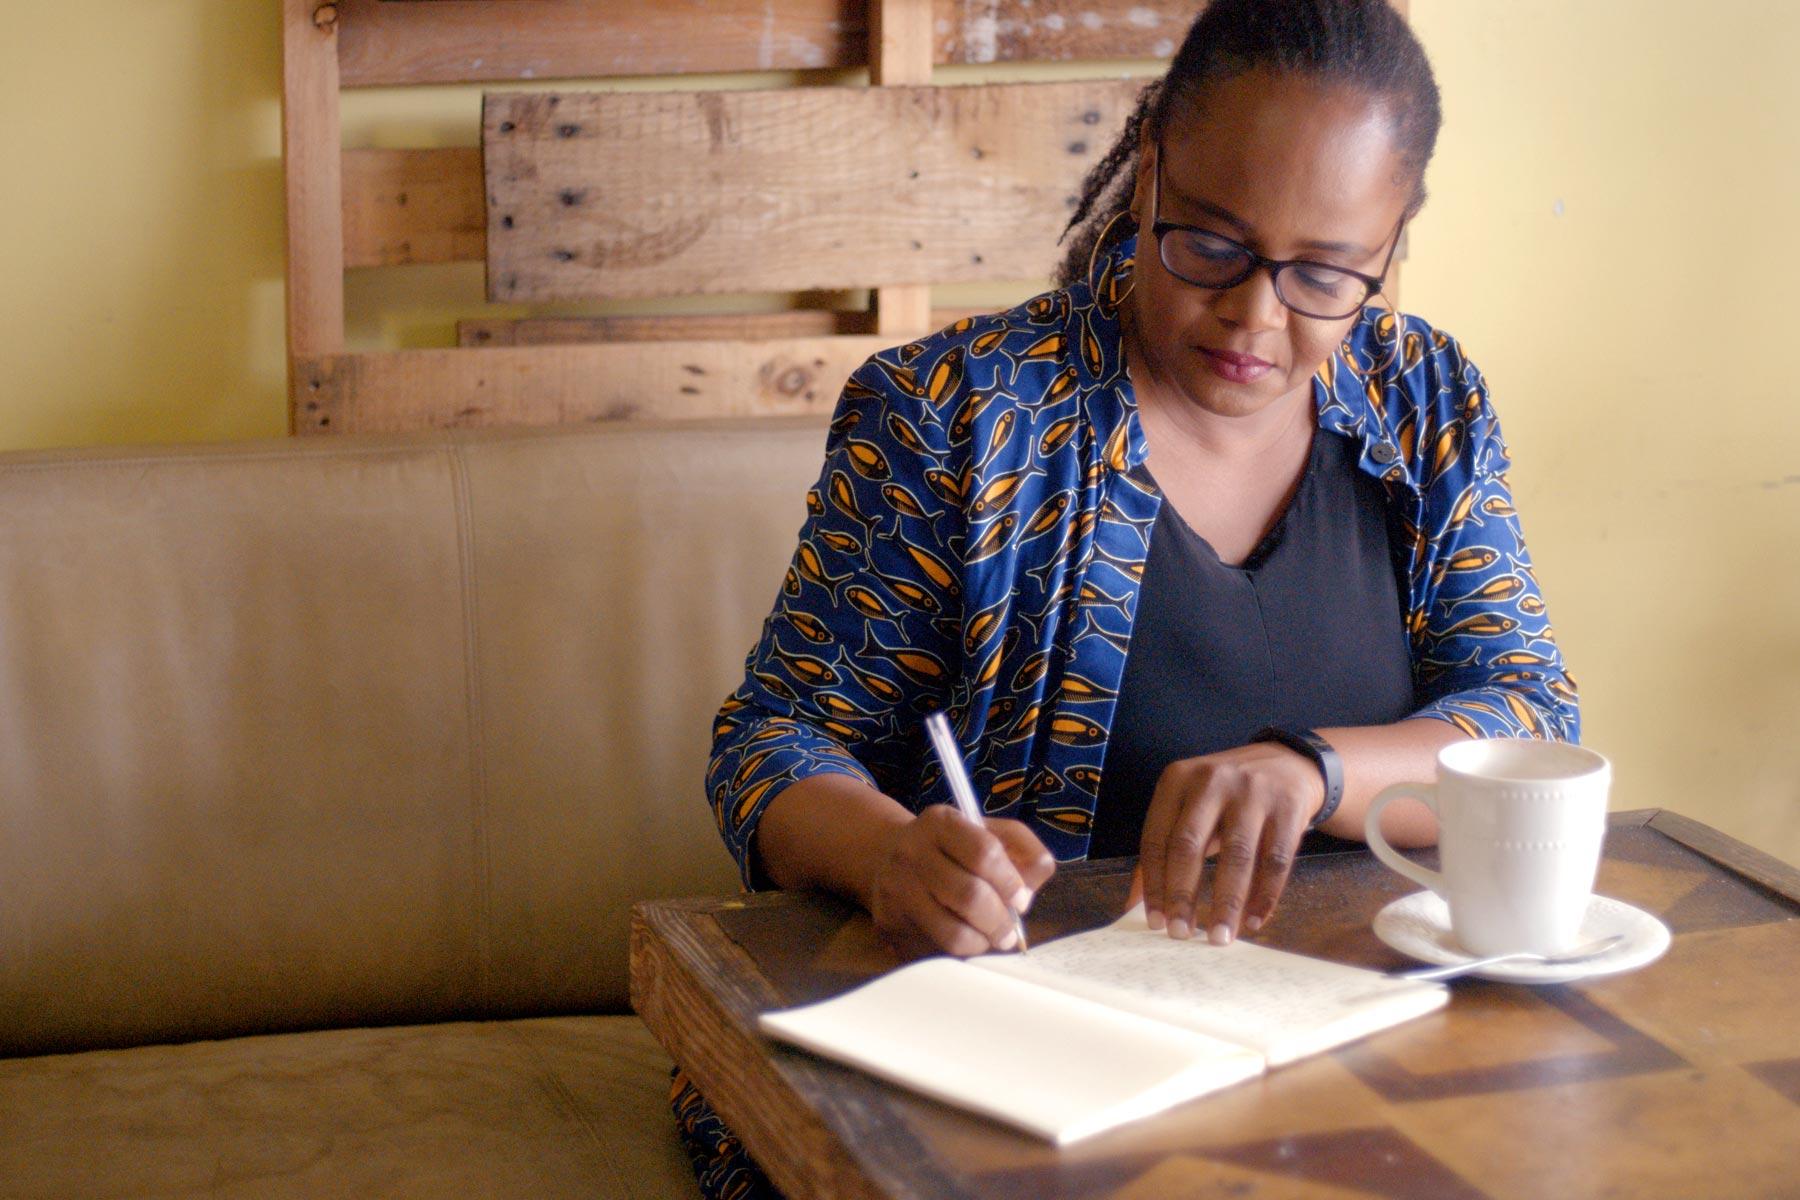 Edwidge Danticat writing in a notebook at a cafe.